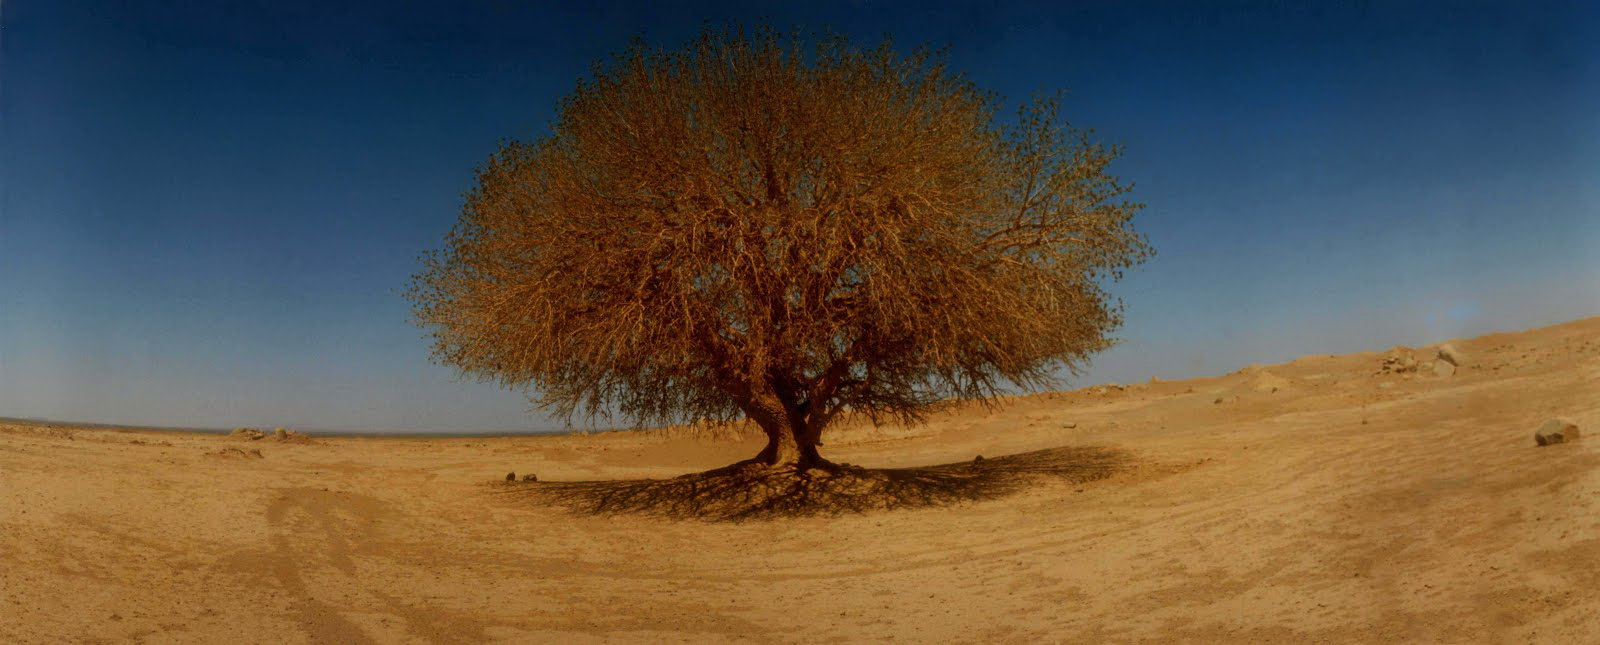 Prophet's tree copy